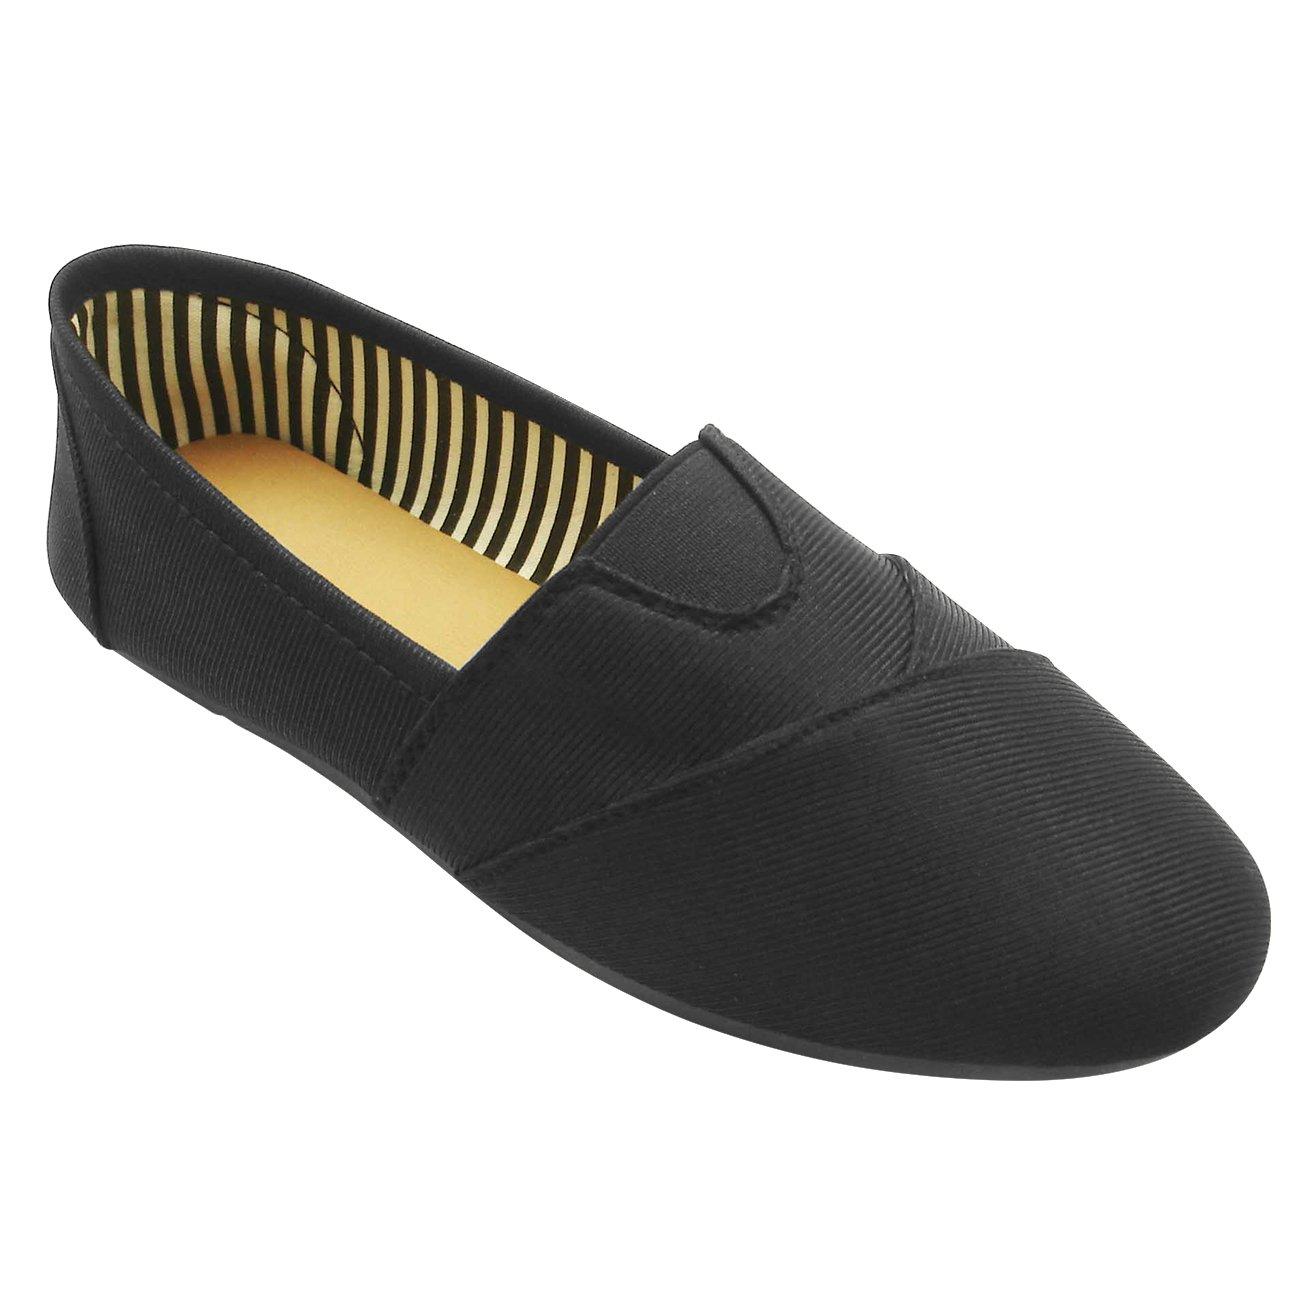 Best Casual Black Foam Sofft Round Toe Low Heel Lightweight Slip On Laceless Unisex Canvas Kung Fu Tenis Sport Beach Fashion Summer Shoe Sneaker for Women Size 9.5 Teen Girl Men (Size 8 Men, Black)